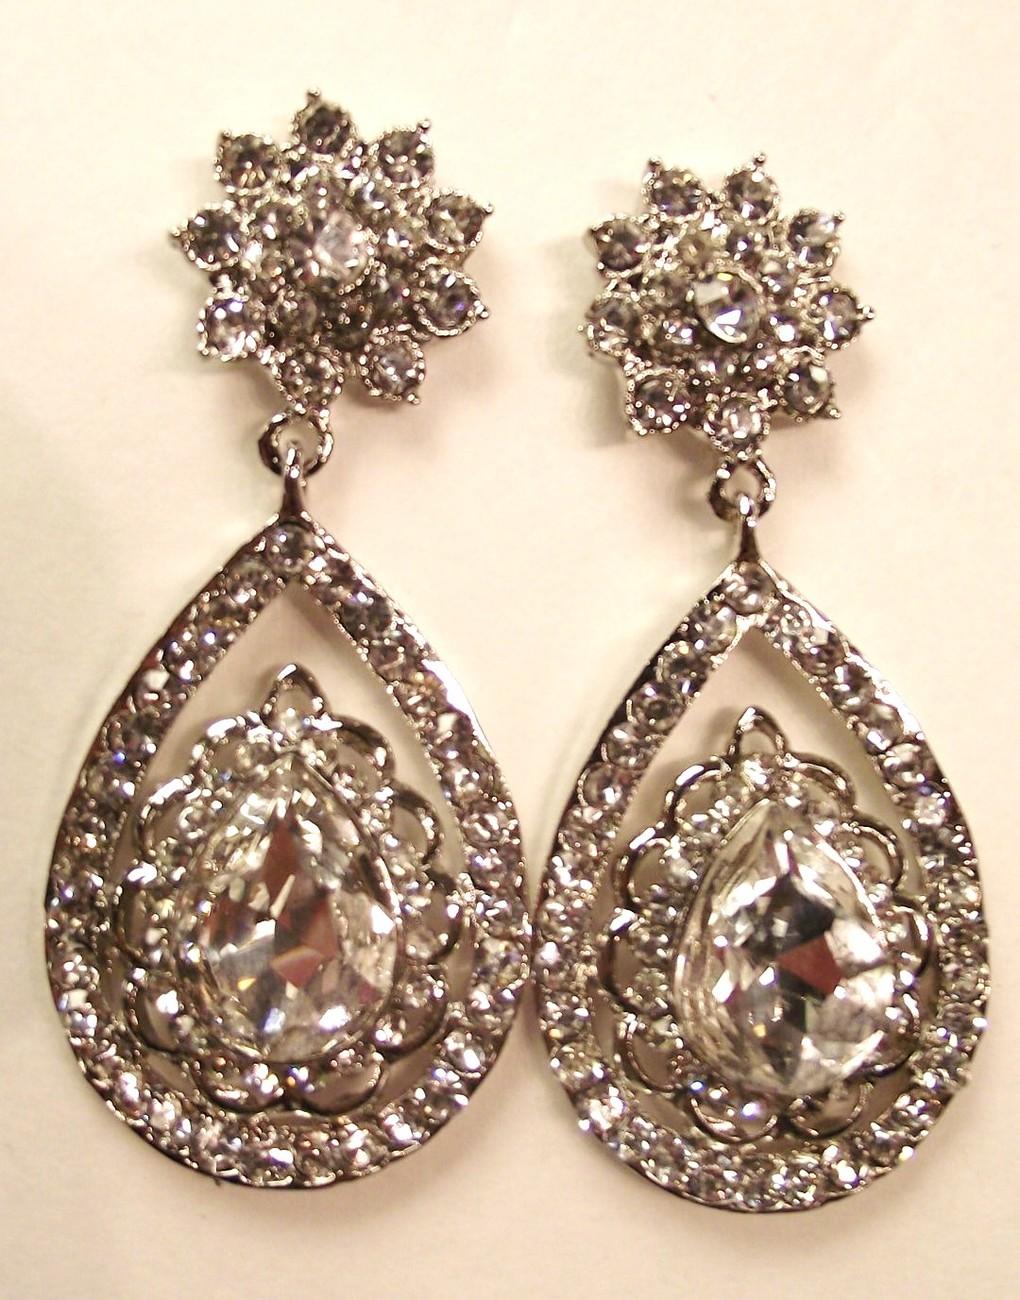 Silver Clear Swarovski Crystals Teardrop Bridal Earrings